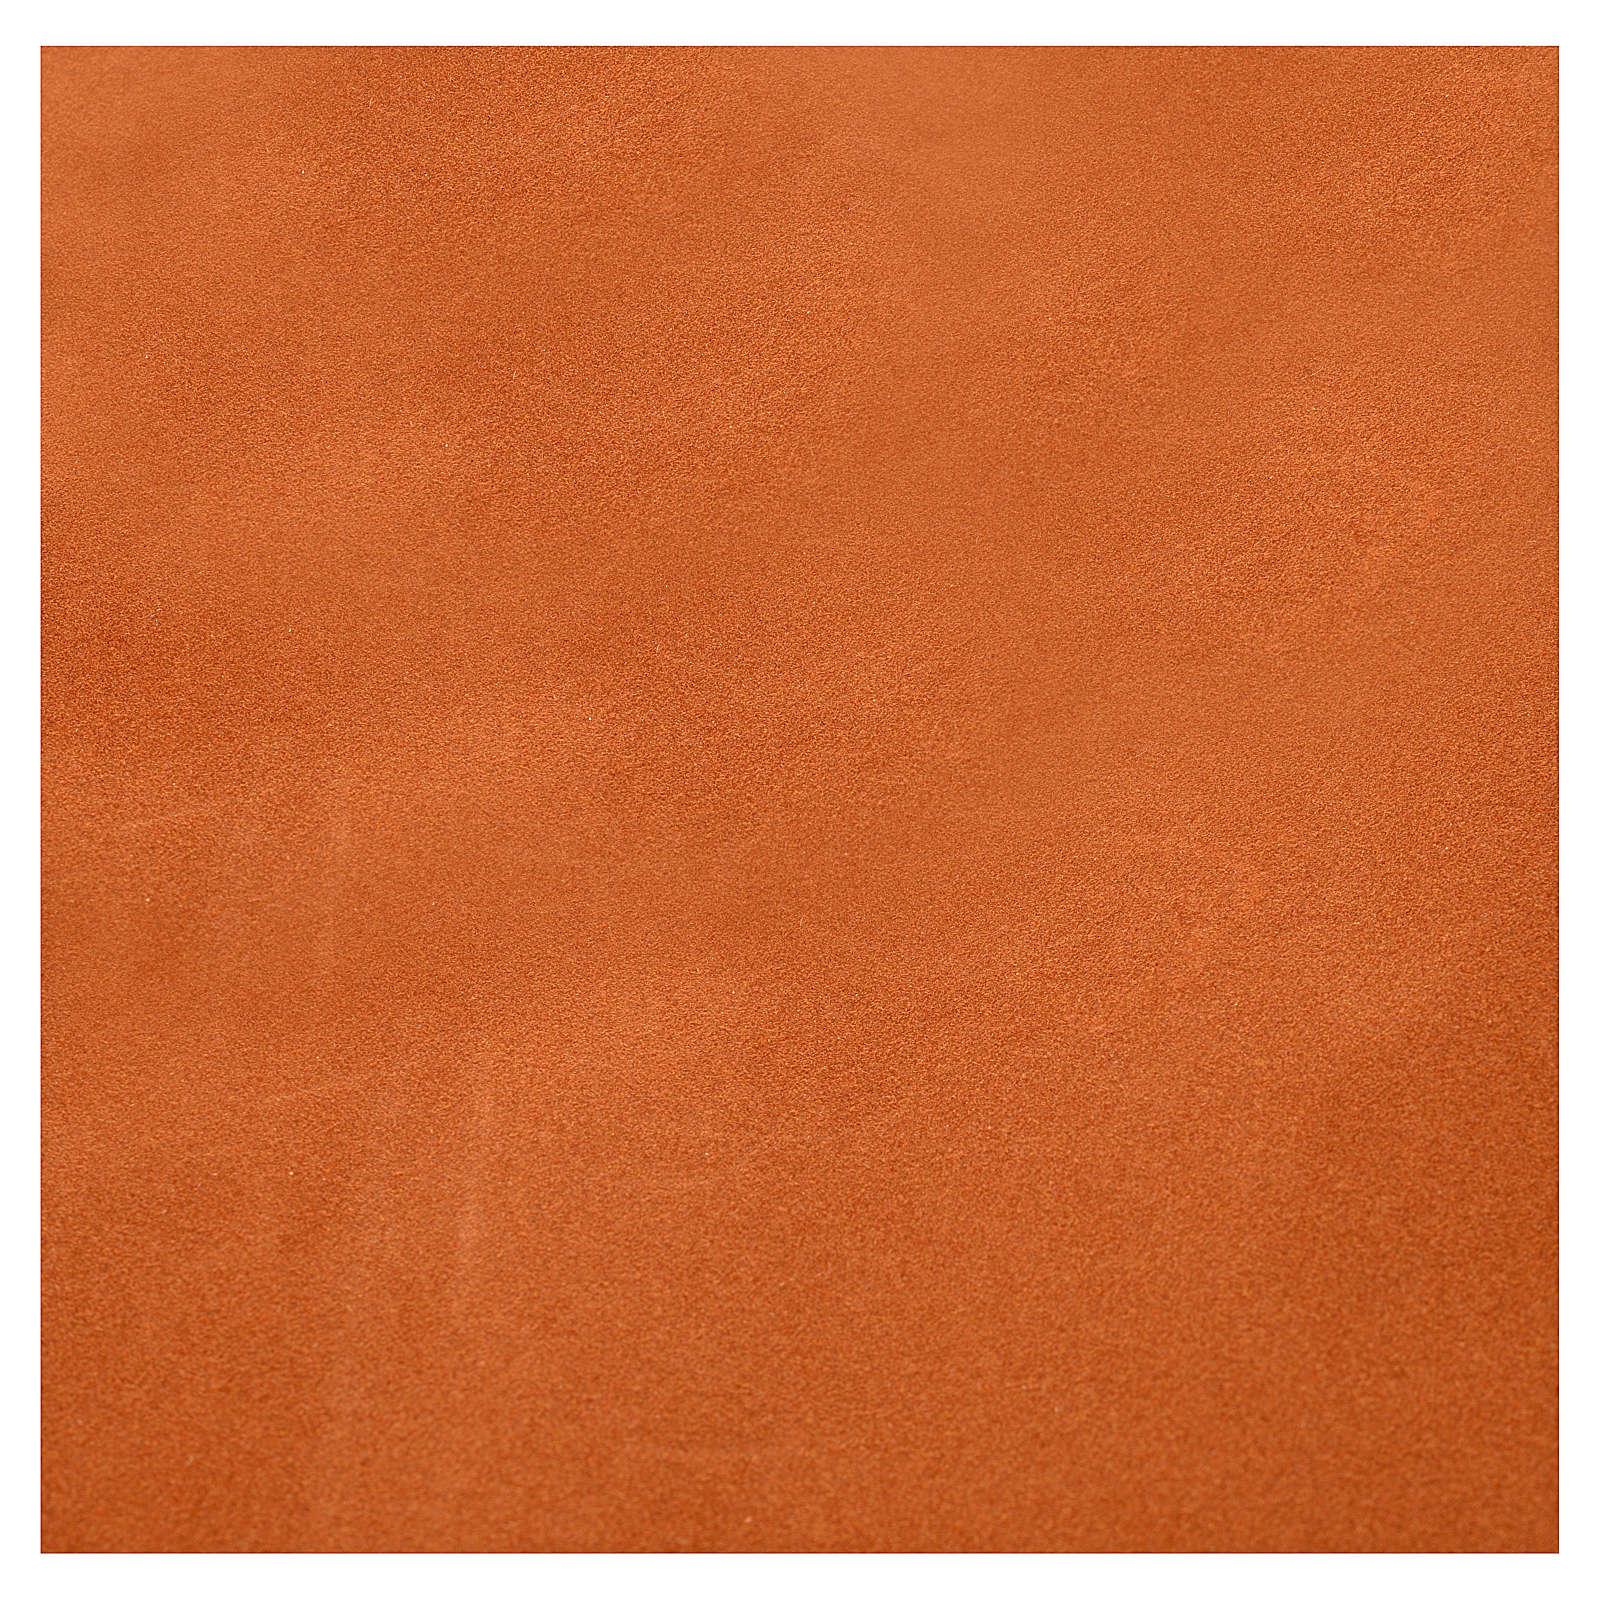 Rollo papel marrón terciopelo cm. 70x50 4